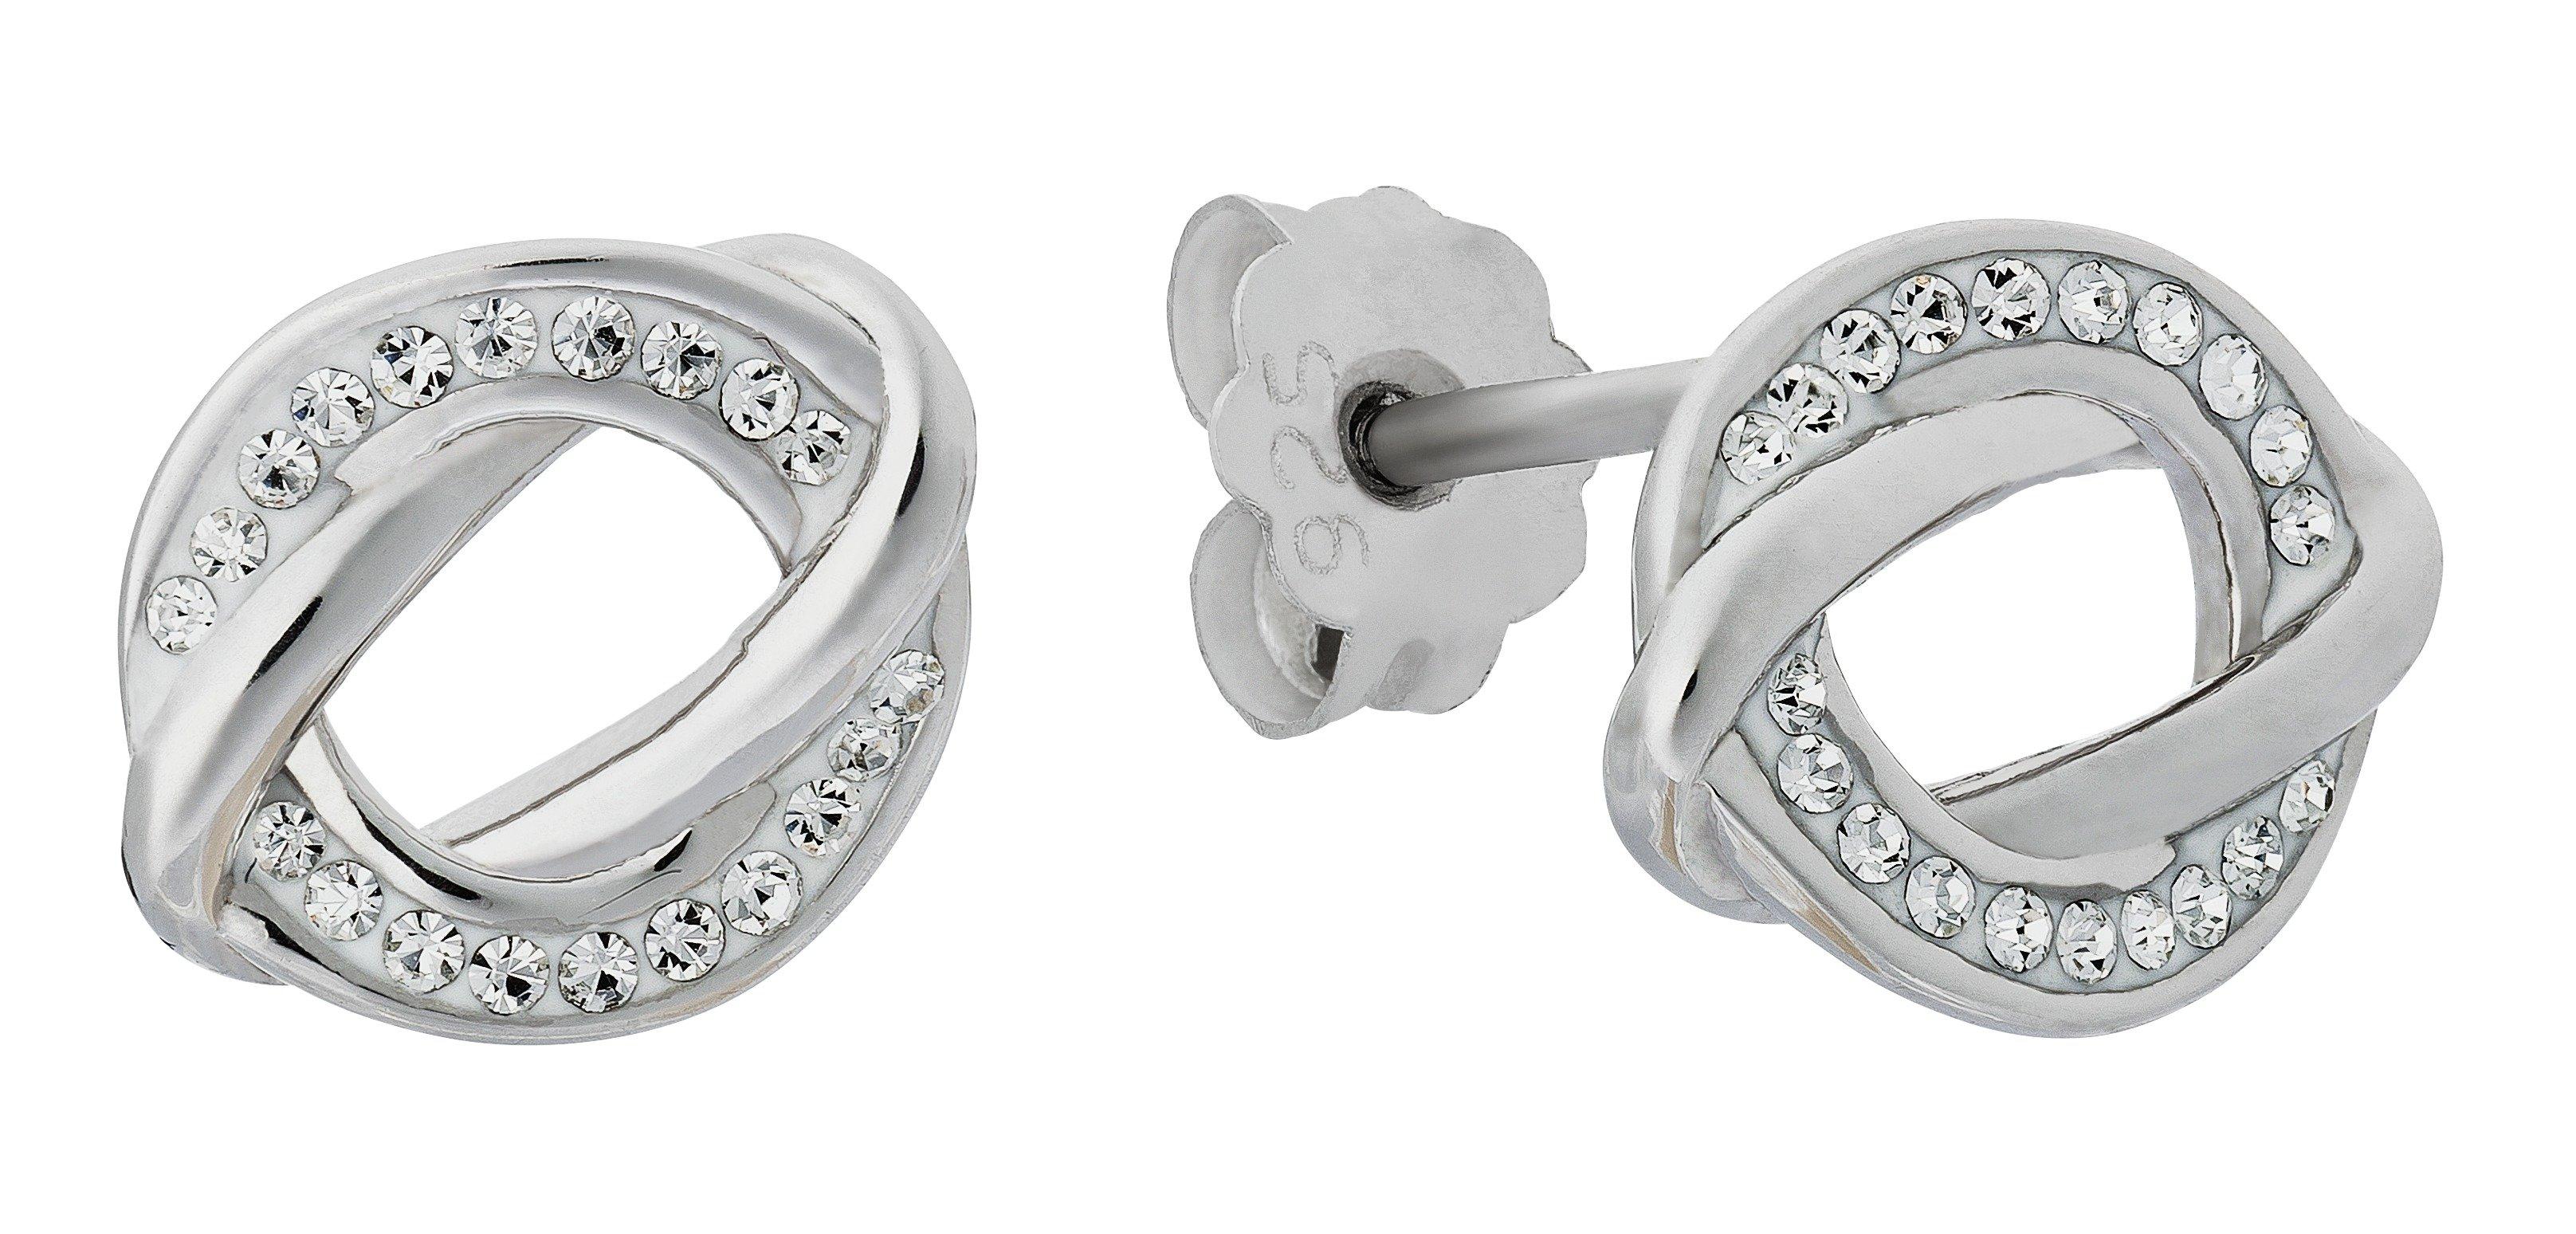 38c809e4b Evoke Rhodium Plated Sterling Silver Round Crystal Studs. (7118854)   Argos  Price Tracker   pricehistory.co.uk